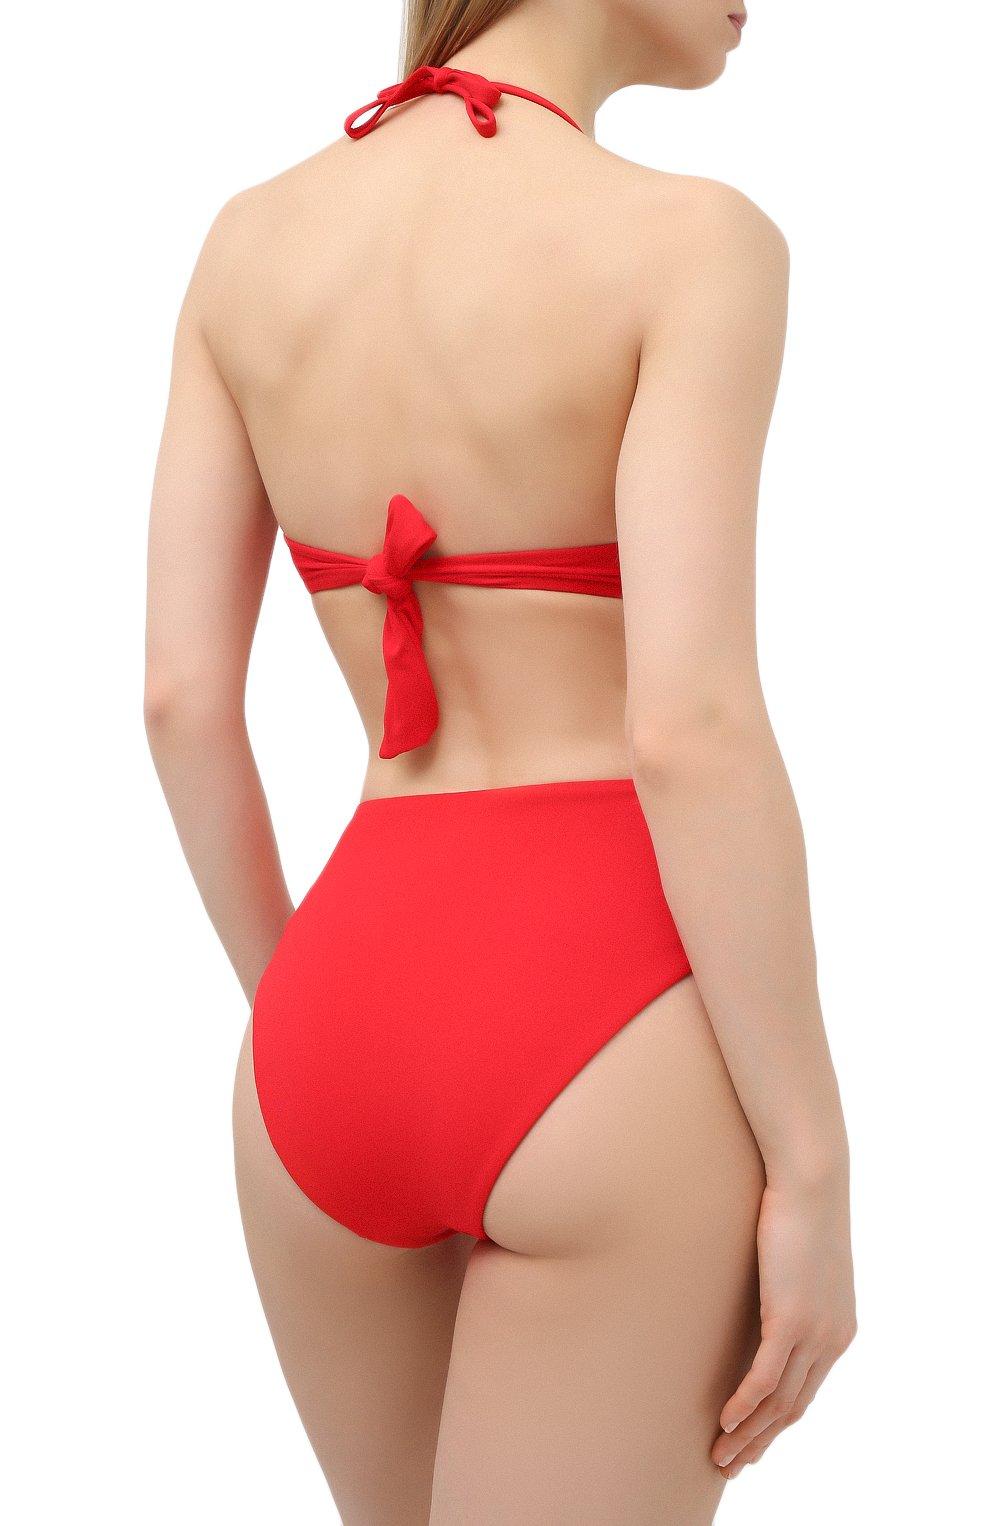 Женский бра-бандо RITRATTI MILANO красного цвета, арт. 71981 | Фото 3